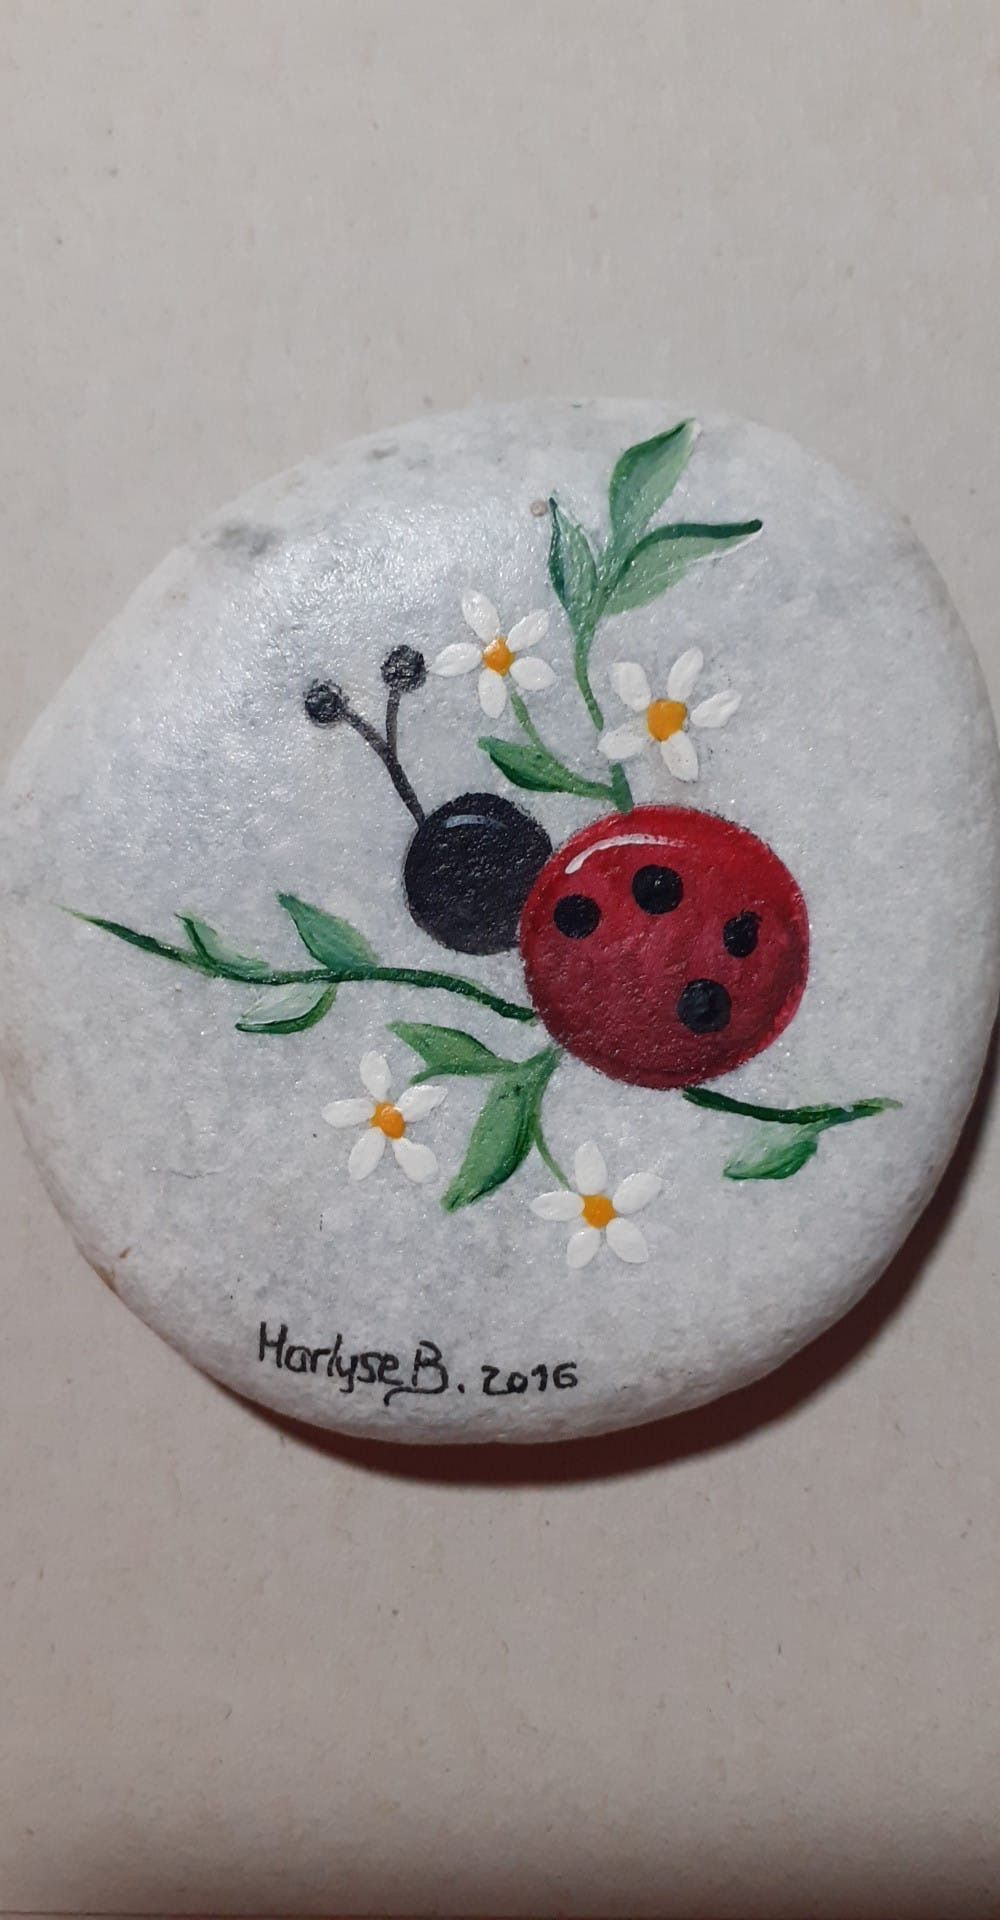 Photo of #stonespaintingchildren #pebblepaintings #stonespaintingchildren